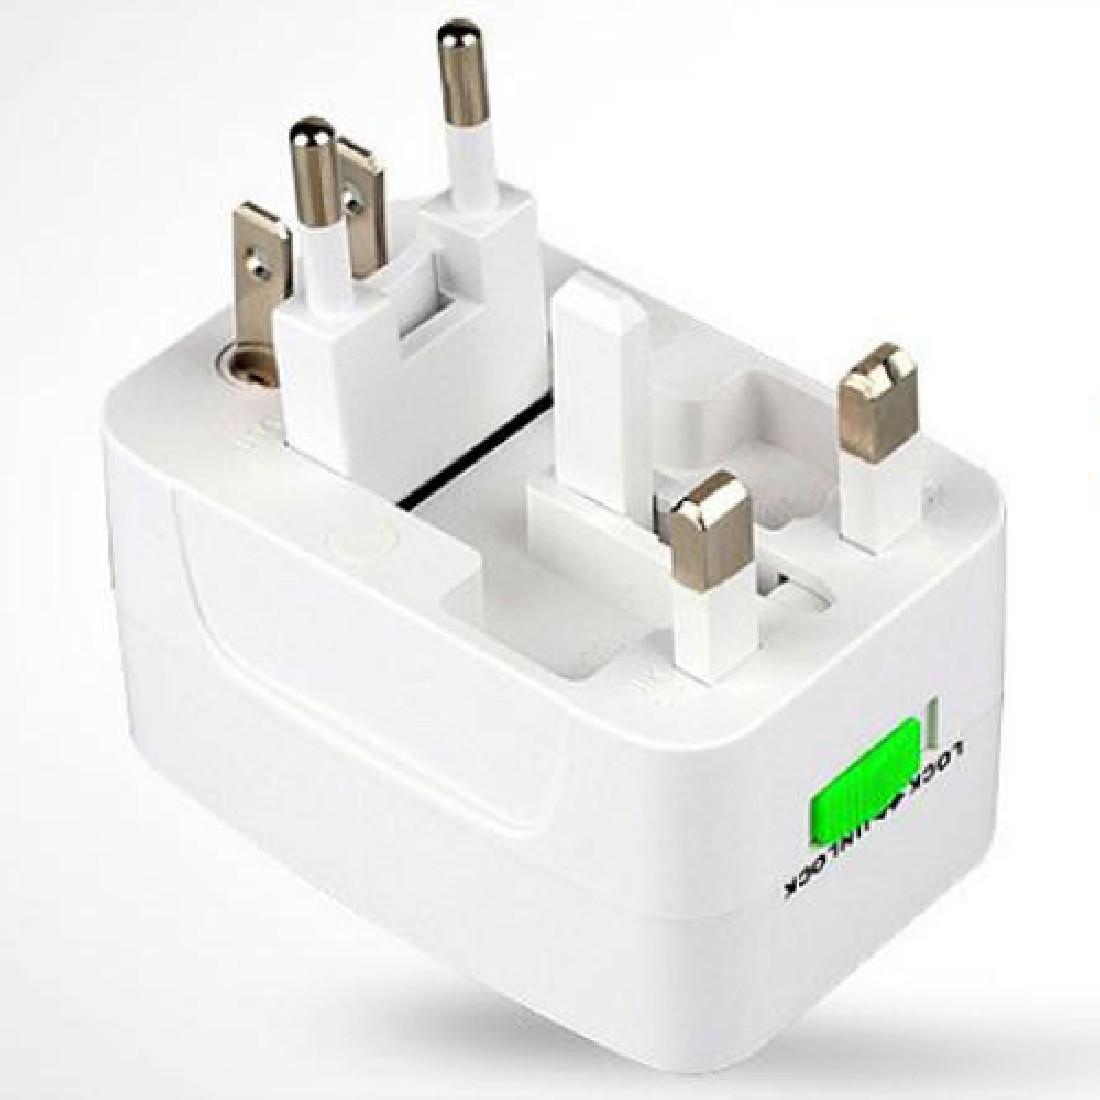 Hot Sale Us To Au Eu Power Universal Travel Adaptor Converter Plug Mini Changer Hot Durable(China (Mainland))